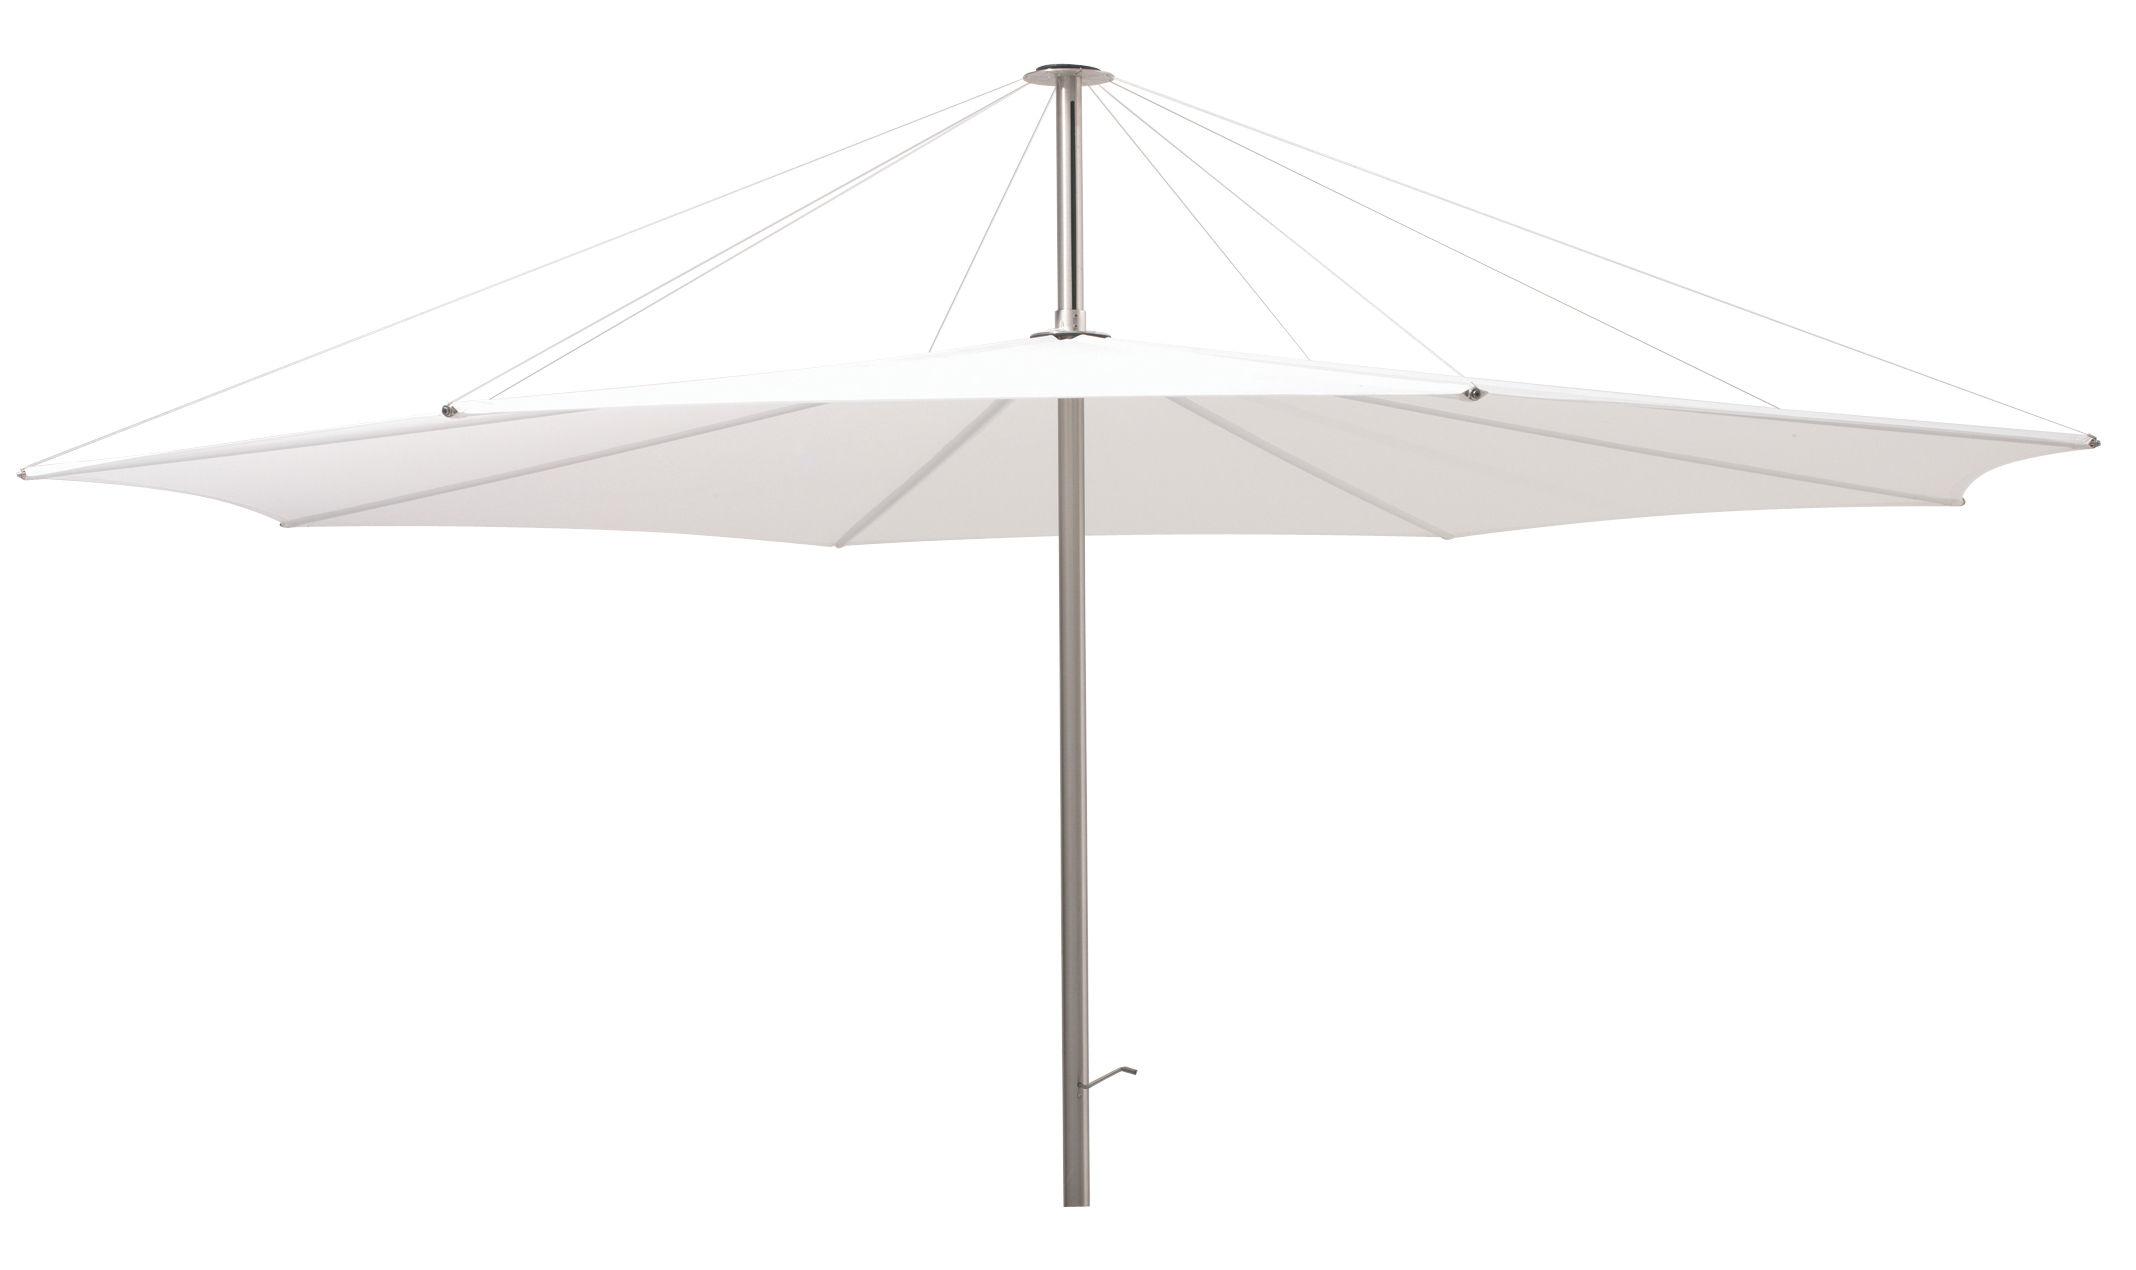 Jardin - Parasols - Parasol Inumbra Ø 400 cm - Extremis - Parasol blanc - Acier inoxydable, Toile de polyester